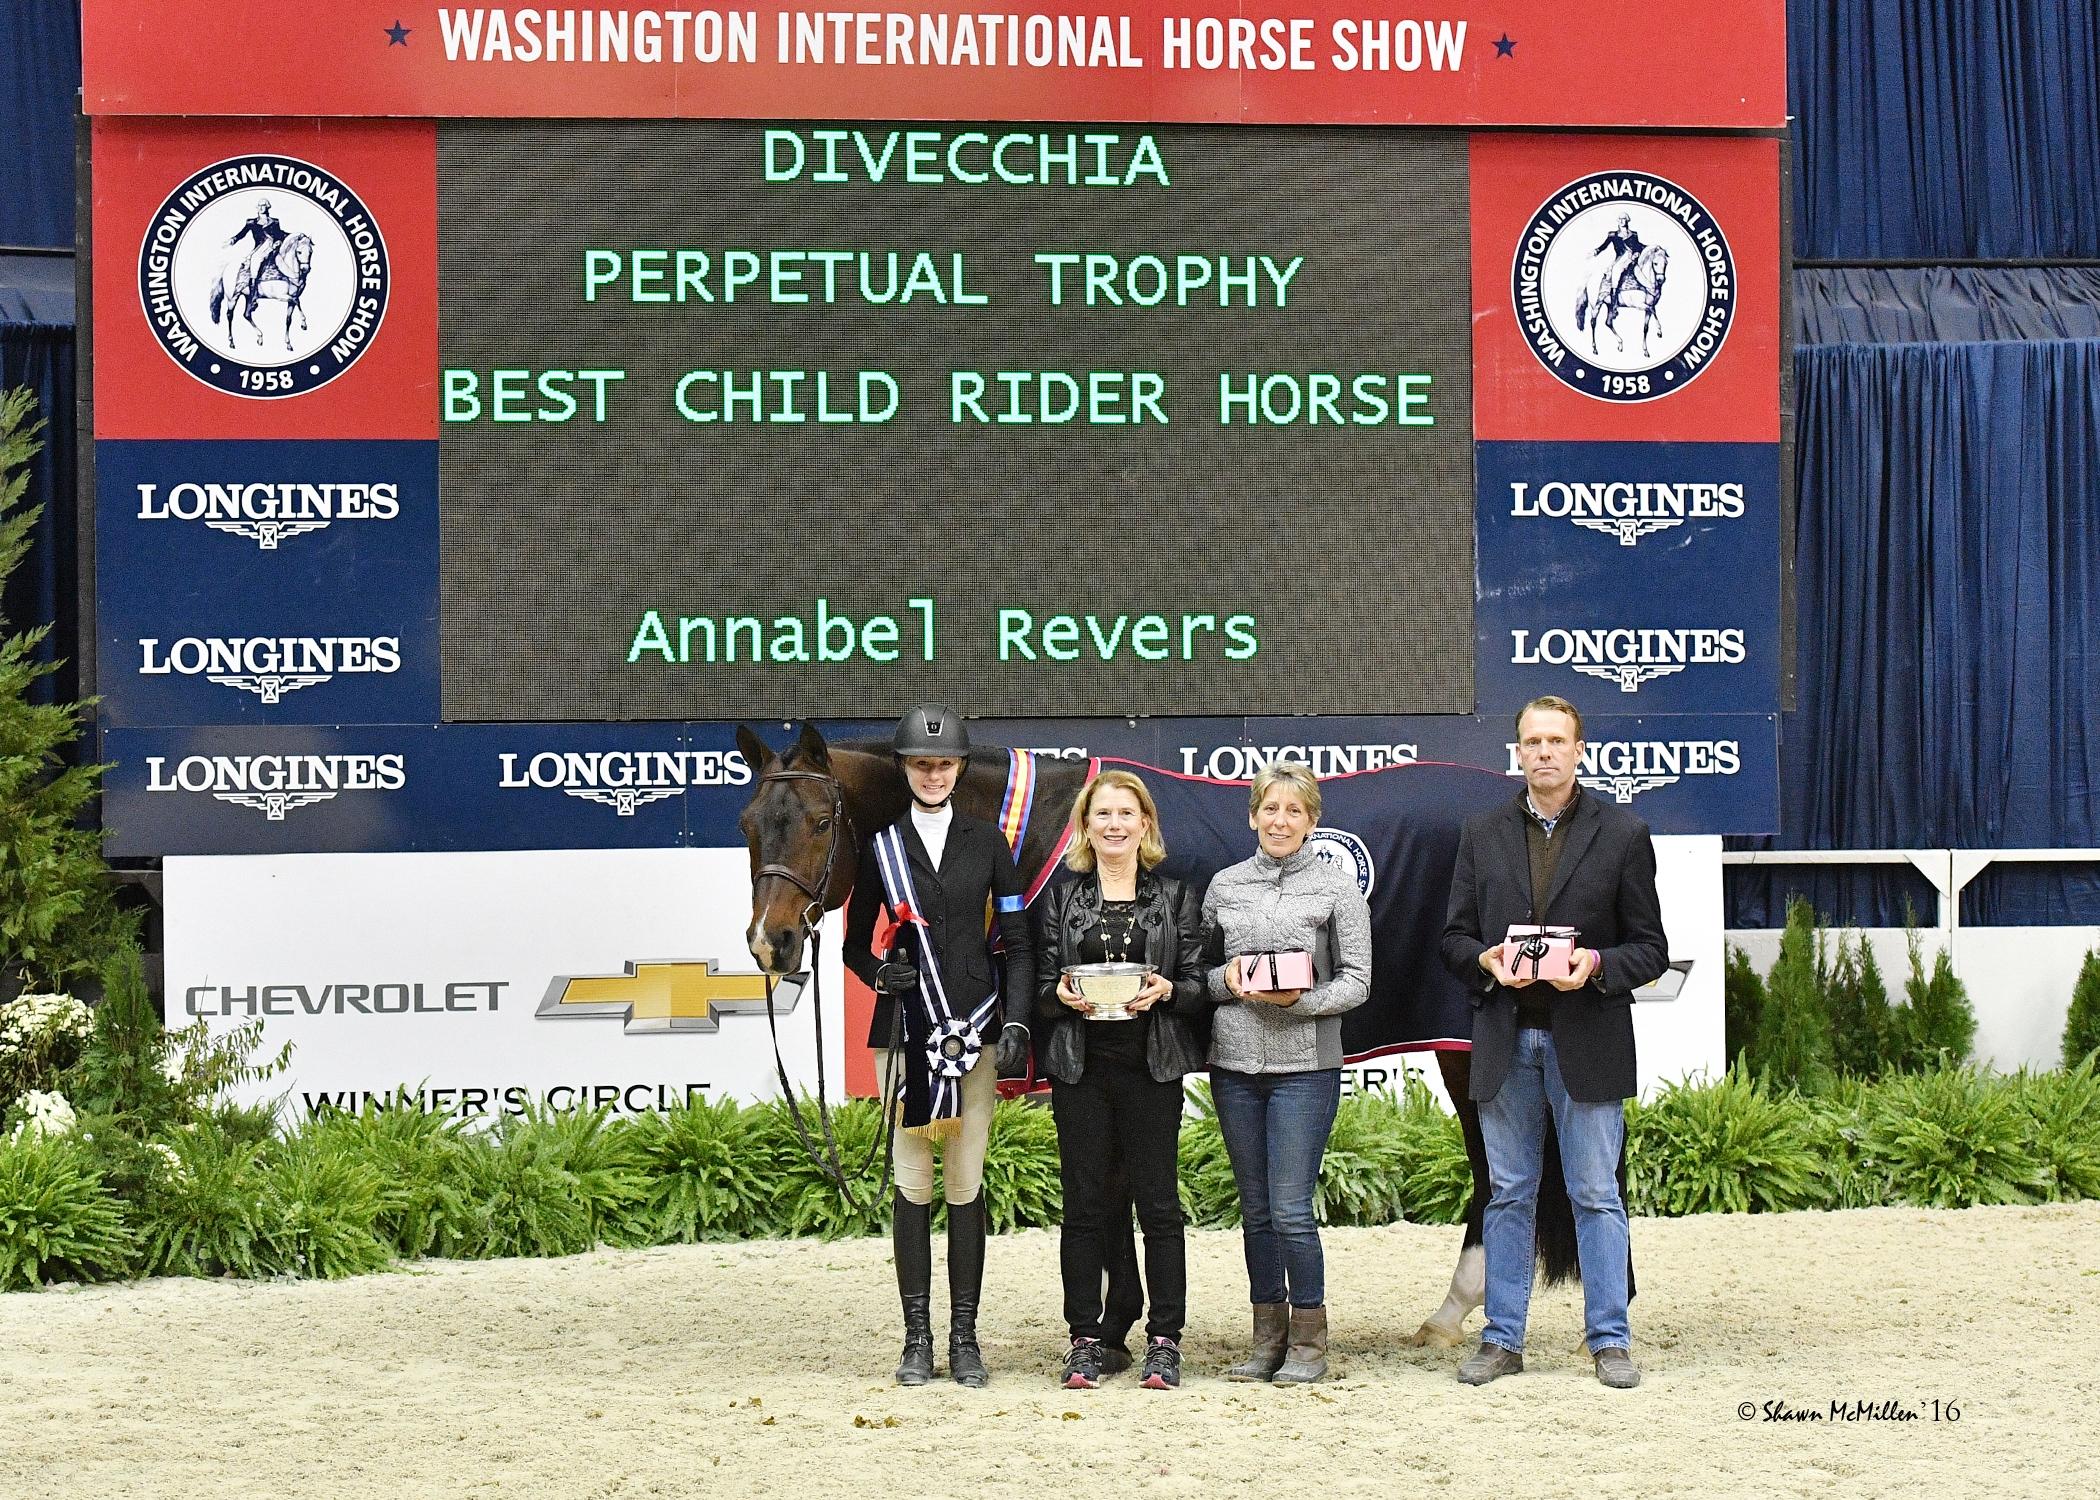 Washington International Horse Show Shines In The City